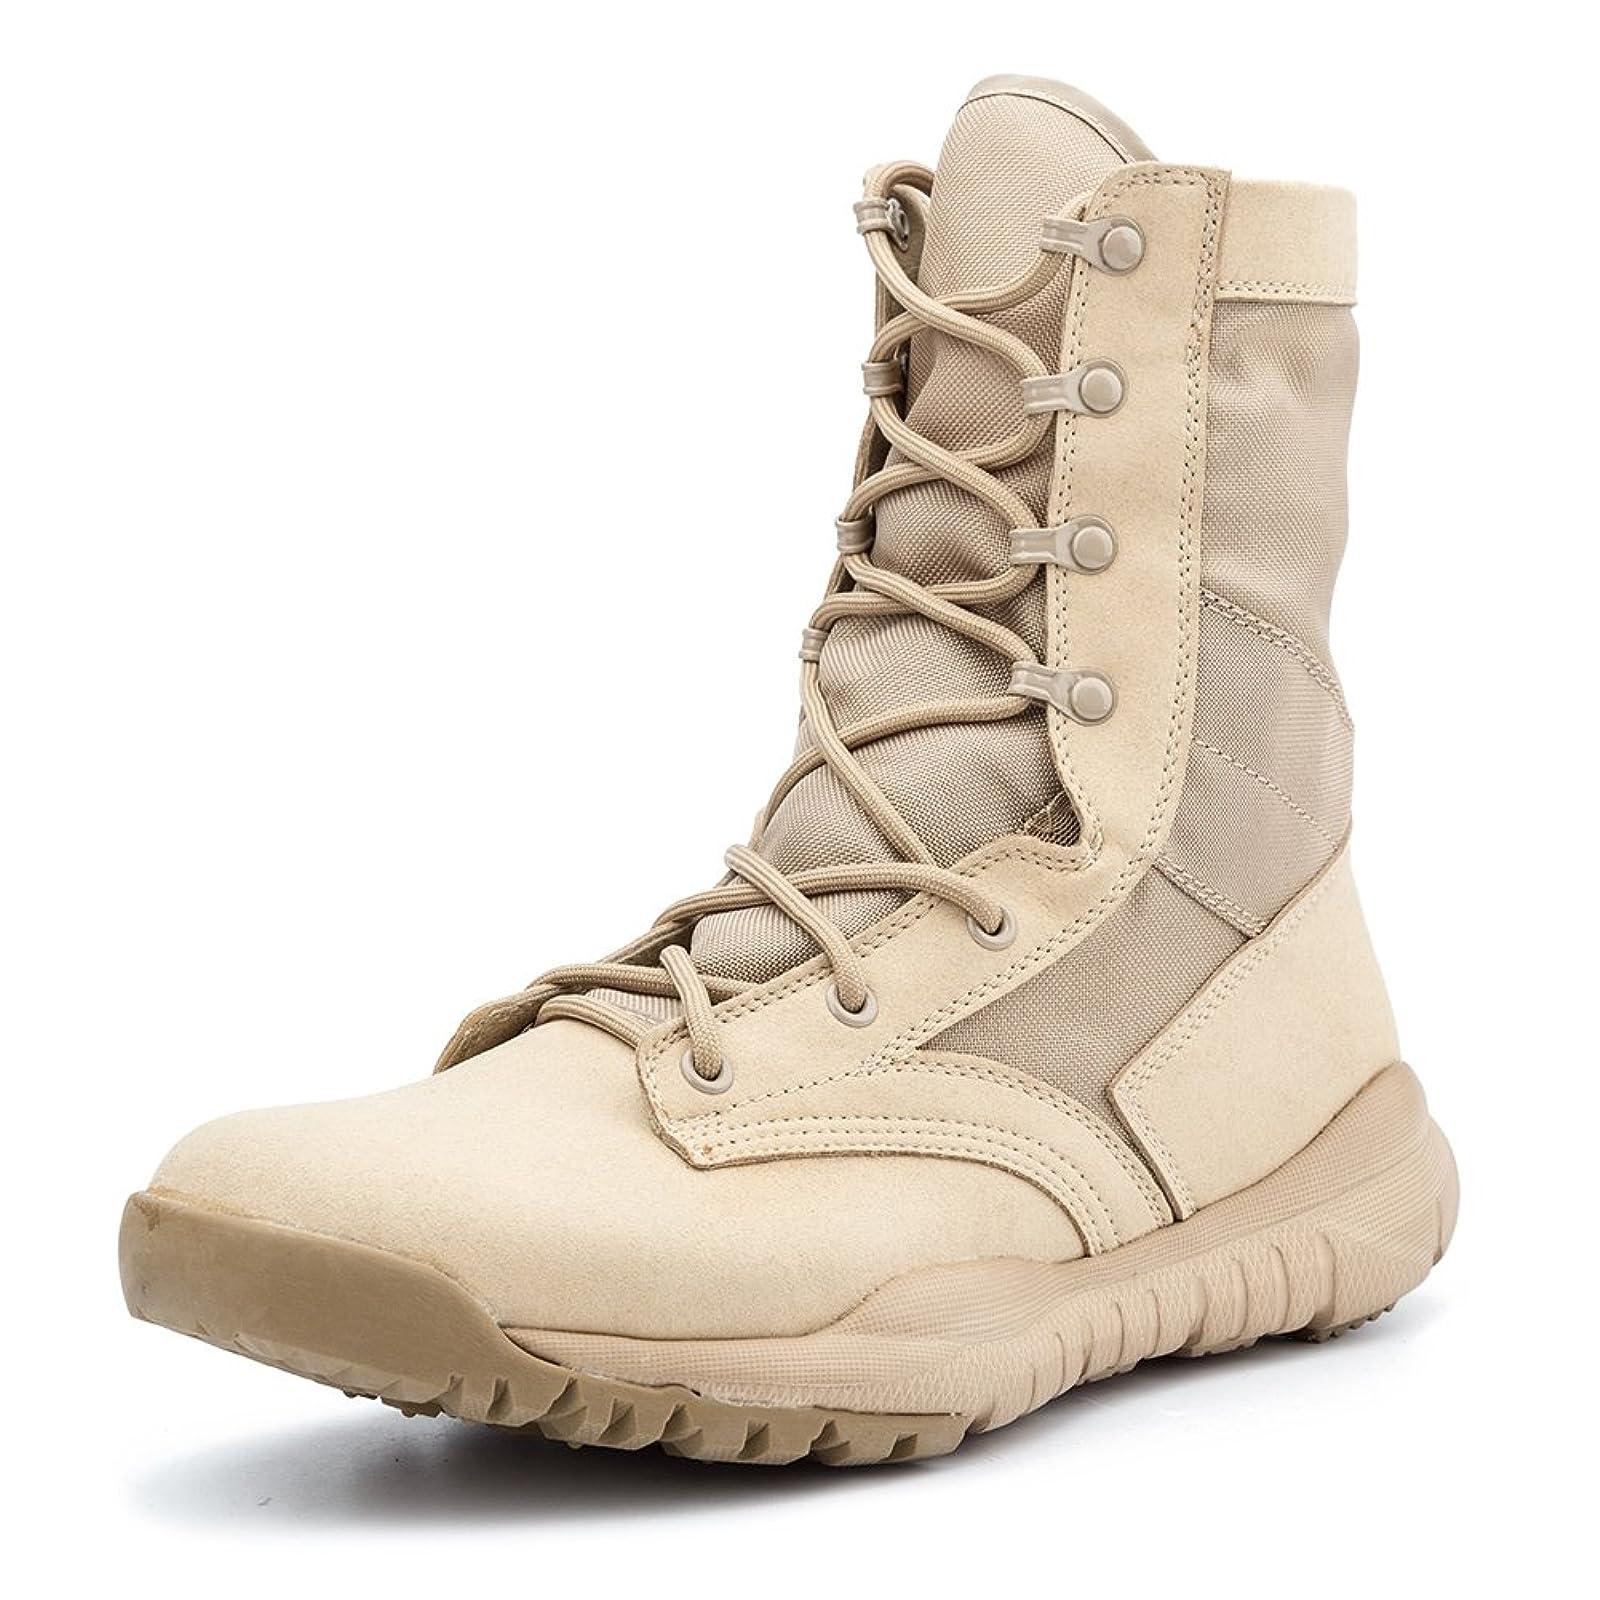 IODSON US Mens' Ultra-Light Combat Boots Beige 9.5 M US - 7